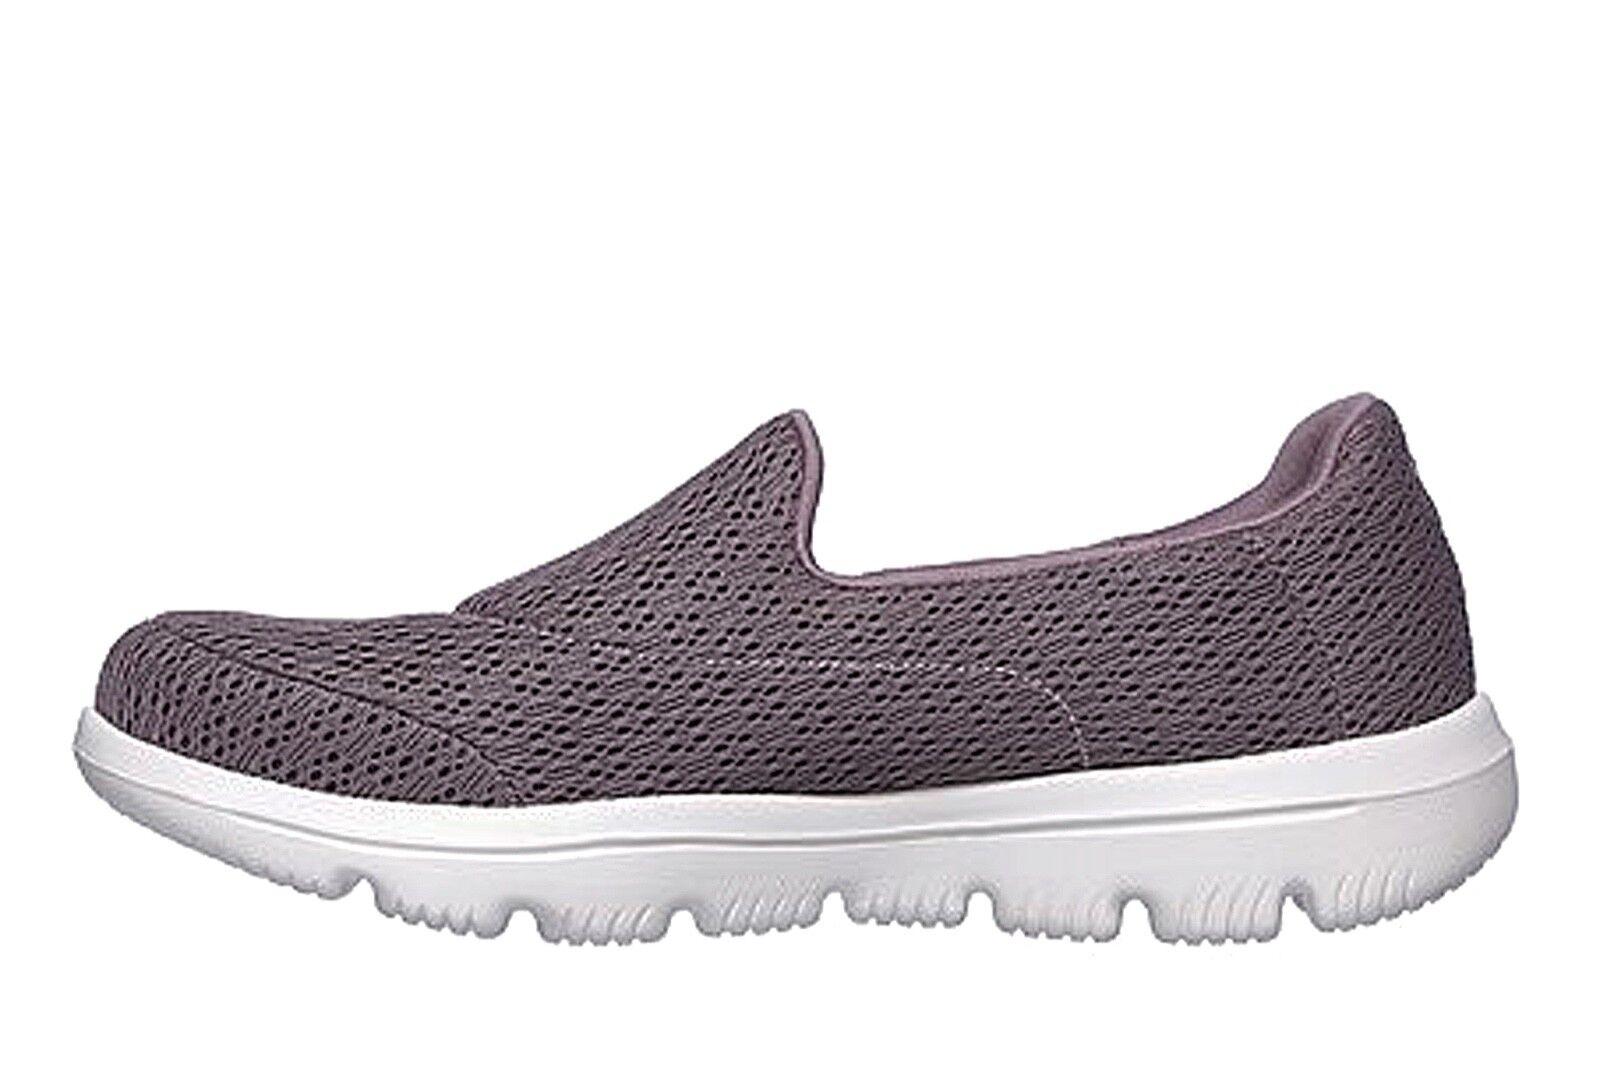 Skechers Skechers Skechers NEW Go Walk Evolution Ultra Persist mauve purple comfort shoes sz 3-10 c0b4ea